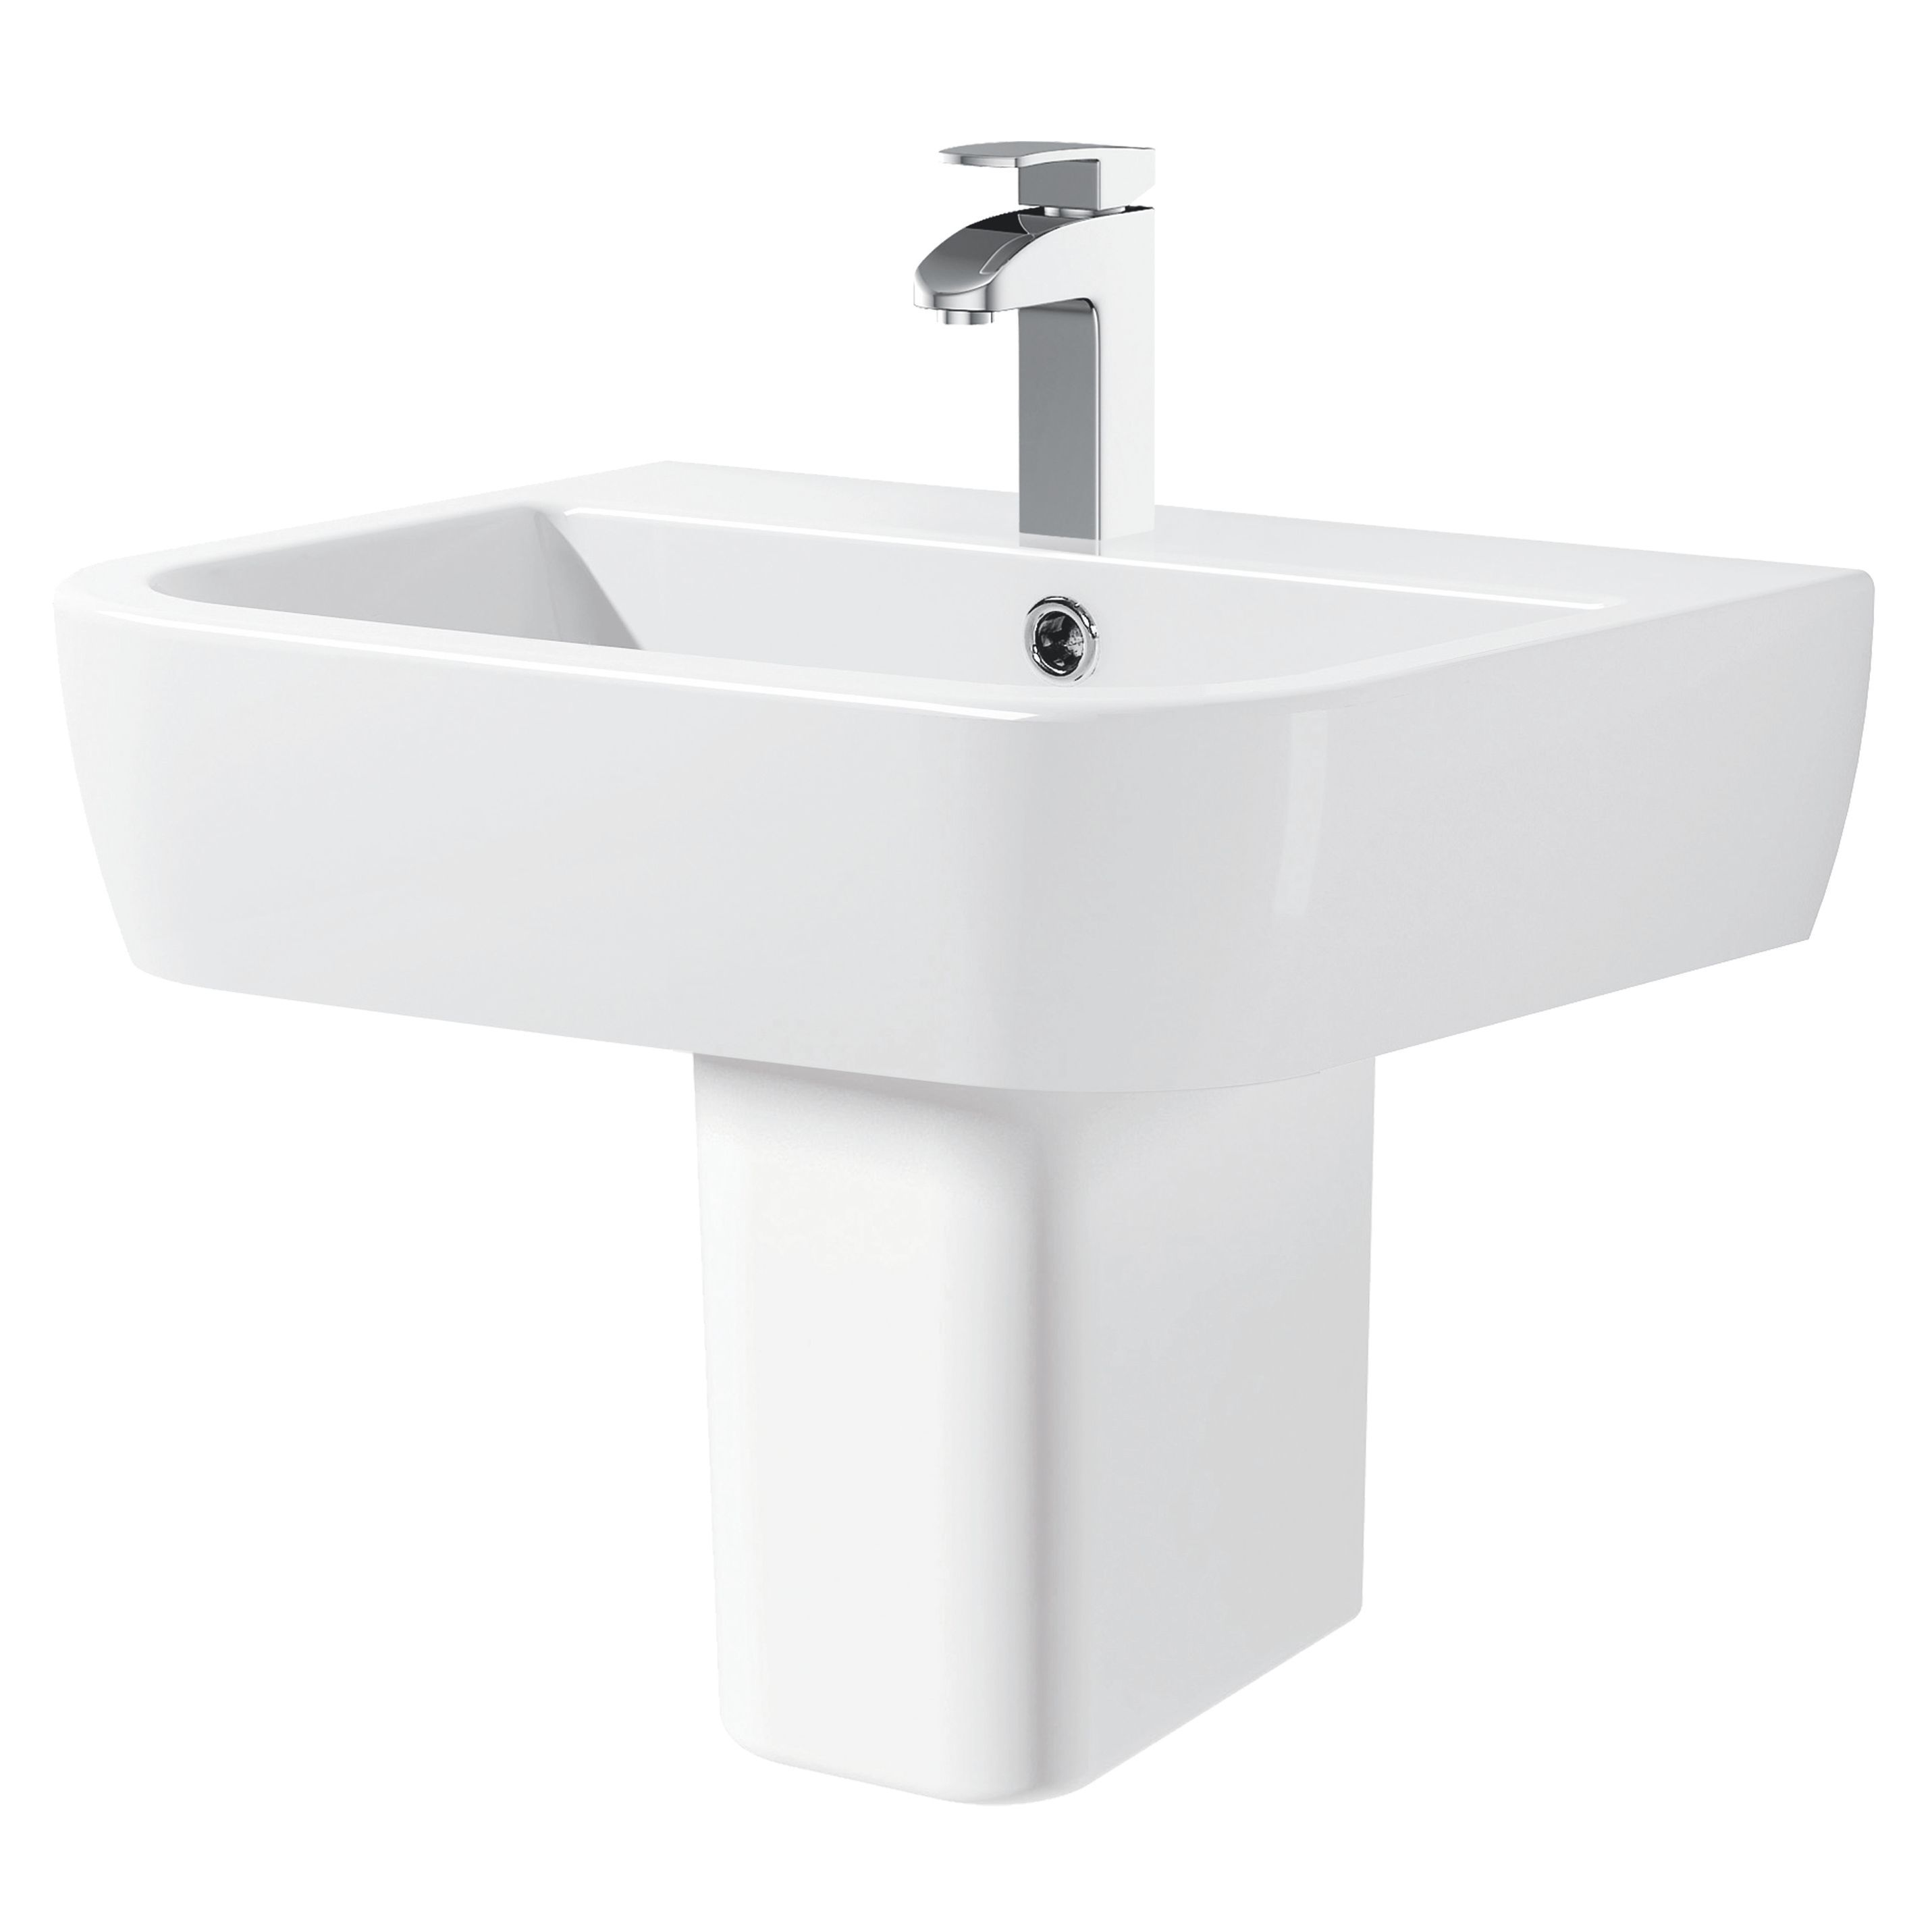 Bathroom Sinks B&Q Ireland cooke & lewis affini square semi pedestal basin | departments